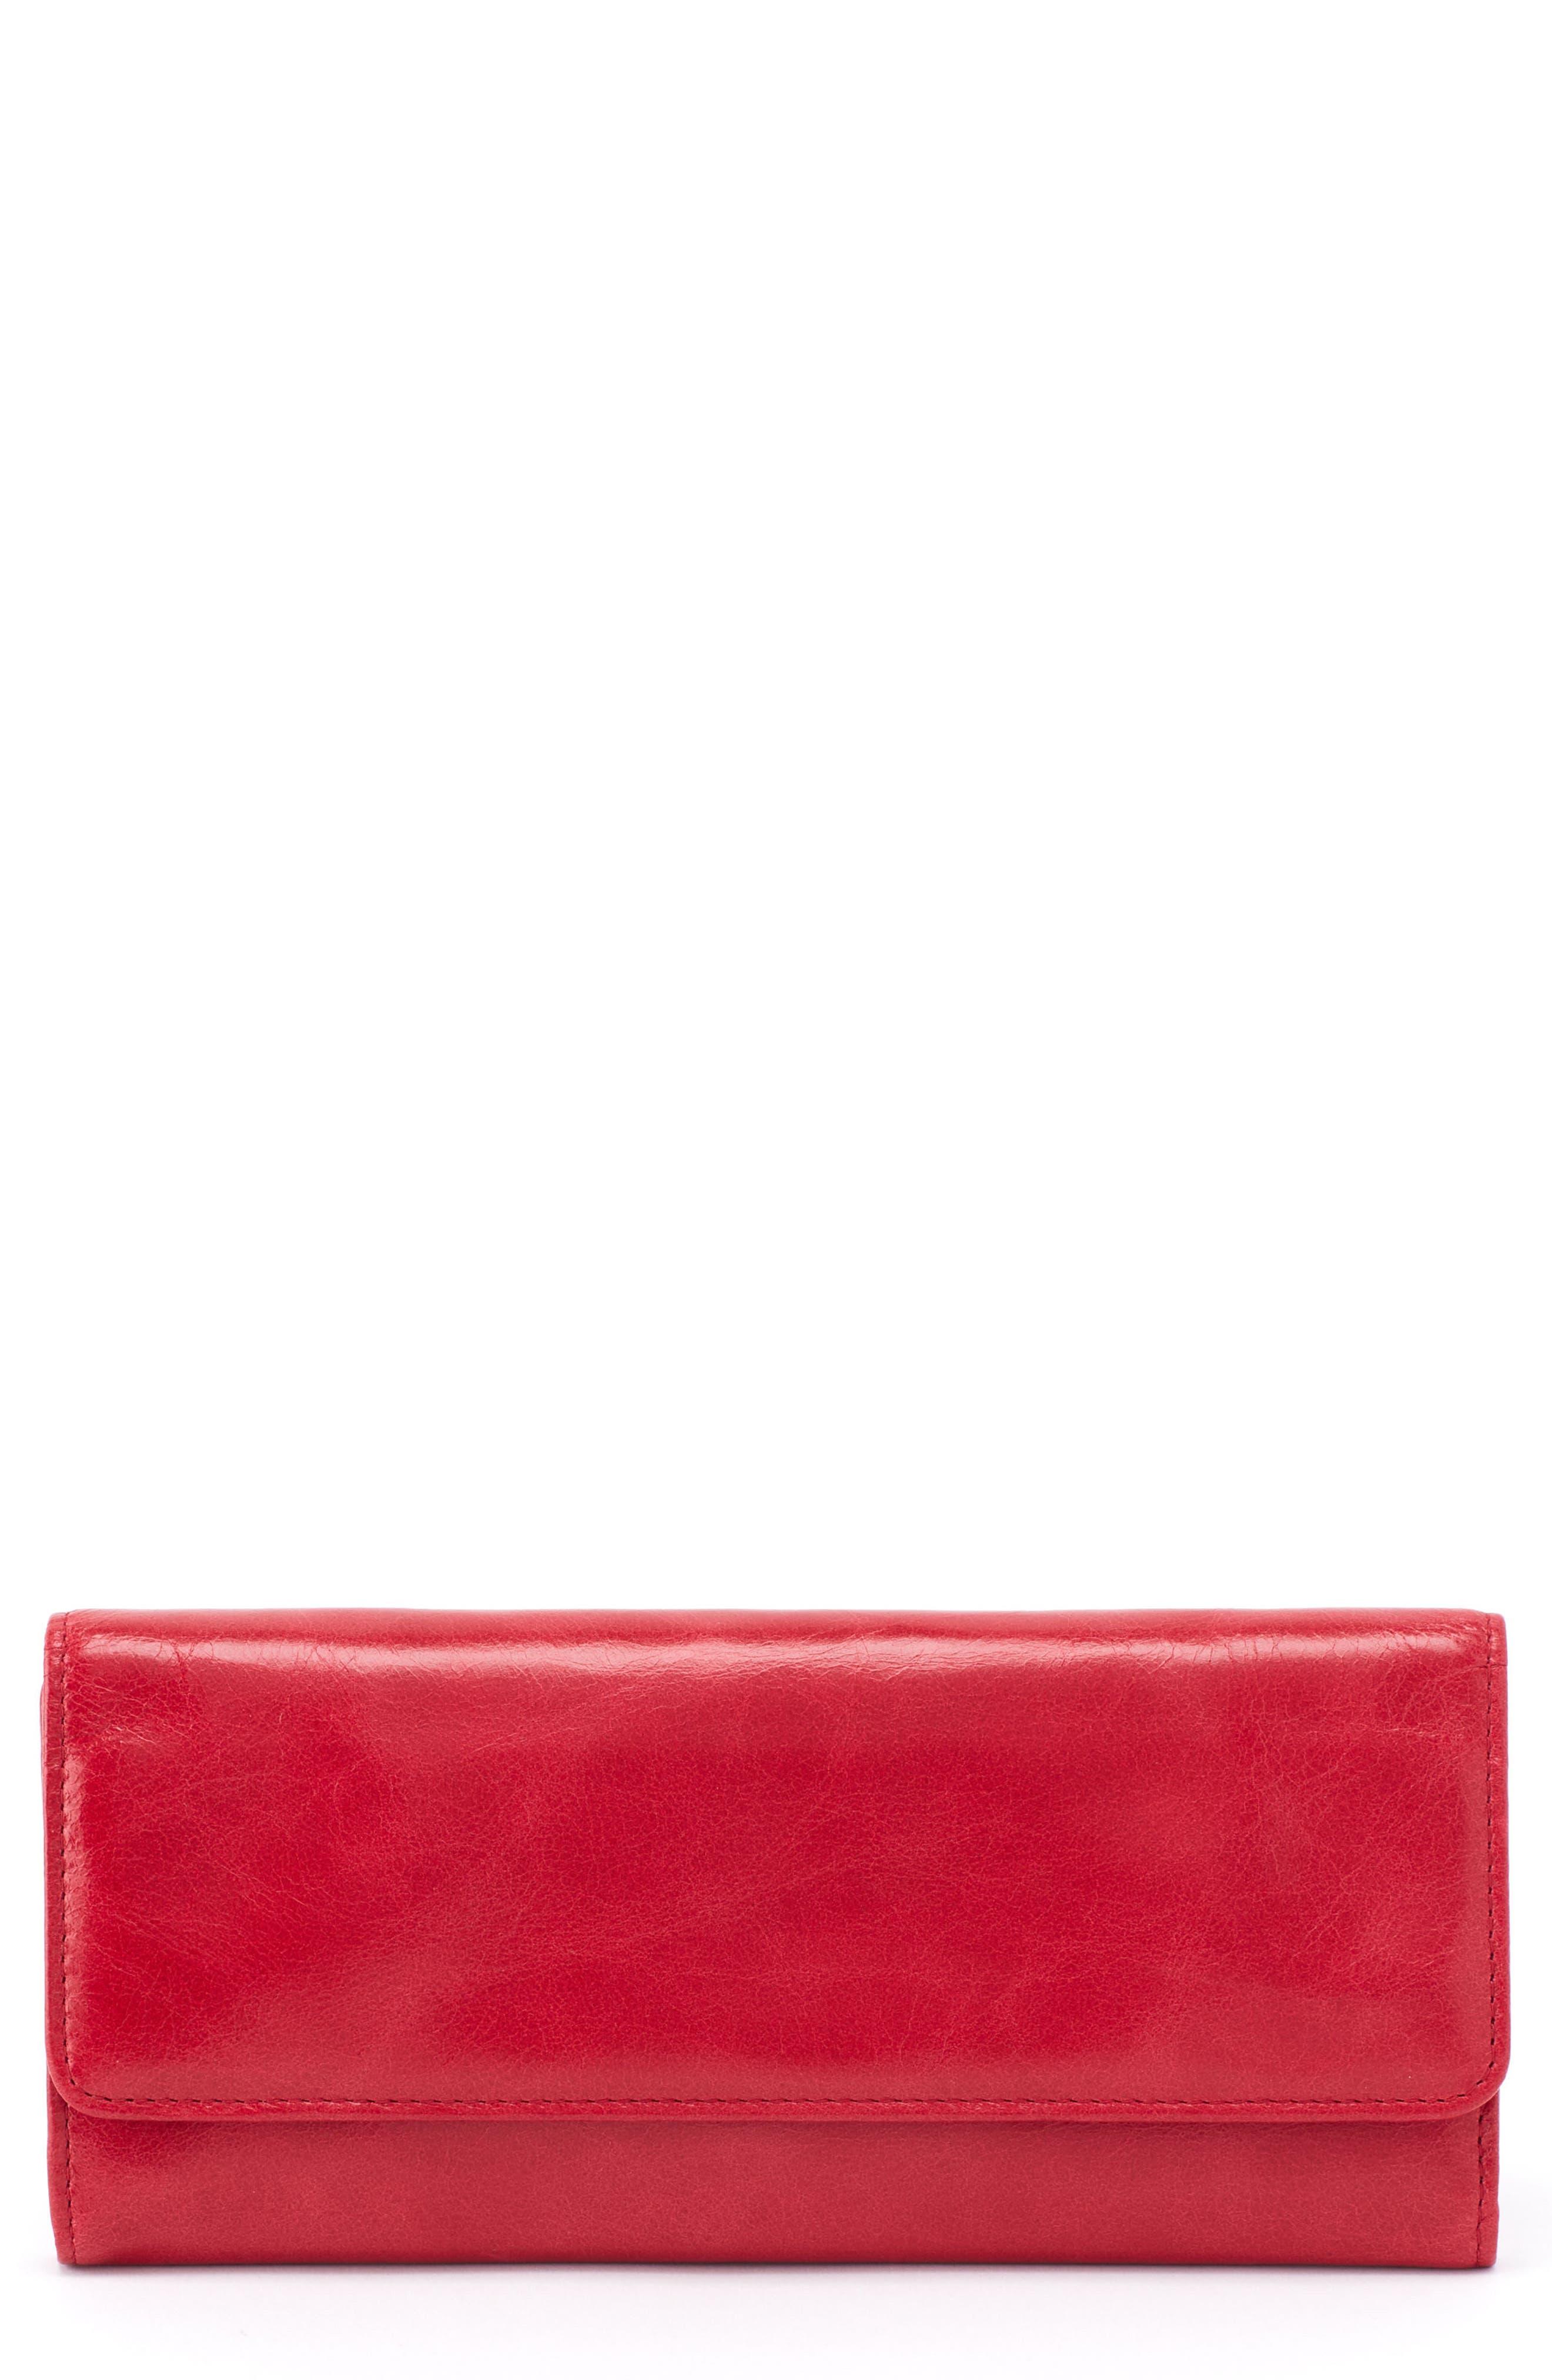 'Sadie' Leather Wallet,                             Main thumbnail 10, color,